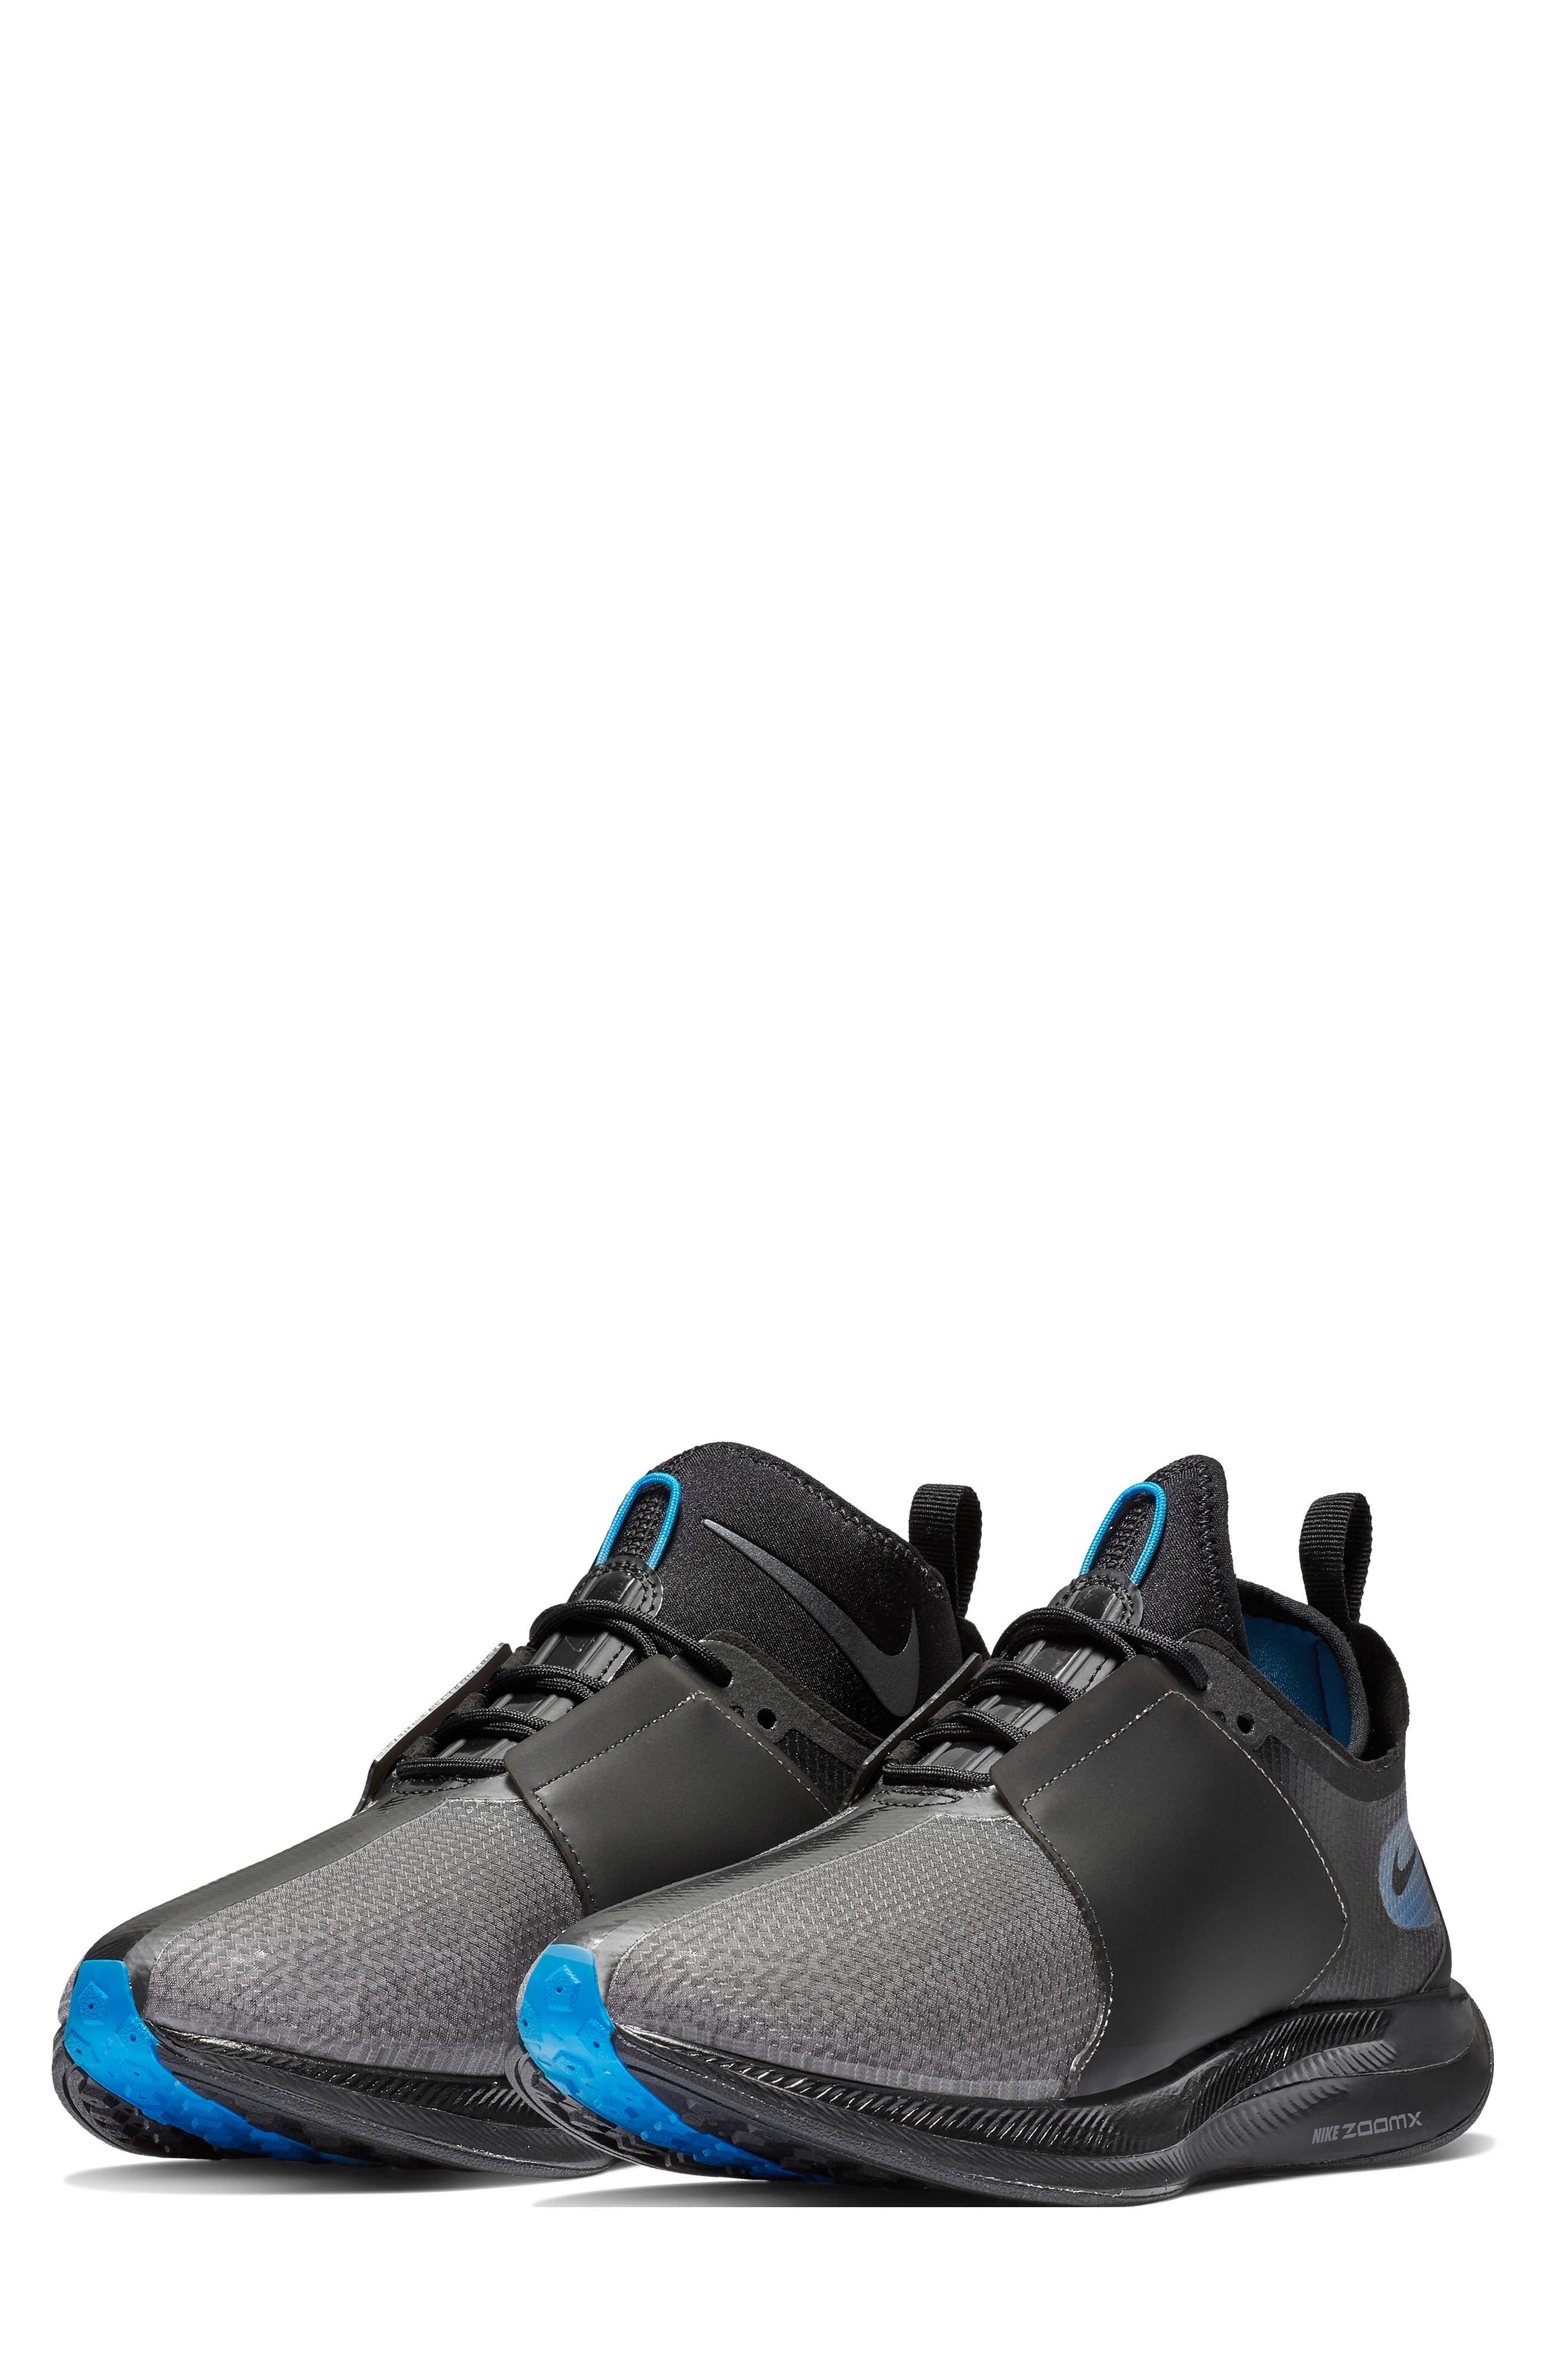 Zoom Pegasus Turbo XX Running Shoe, Main, color, BLACK/ BLACK/ COBALT BLAZE